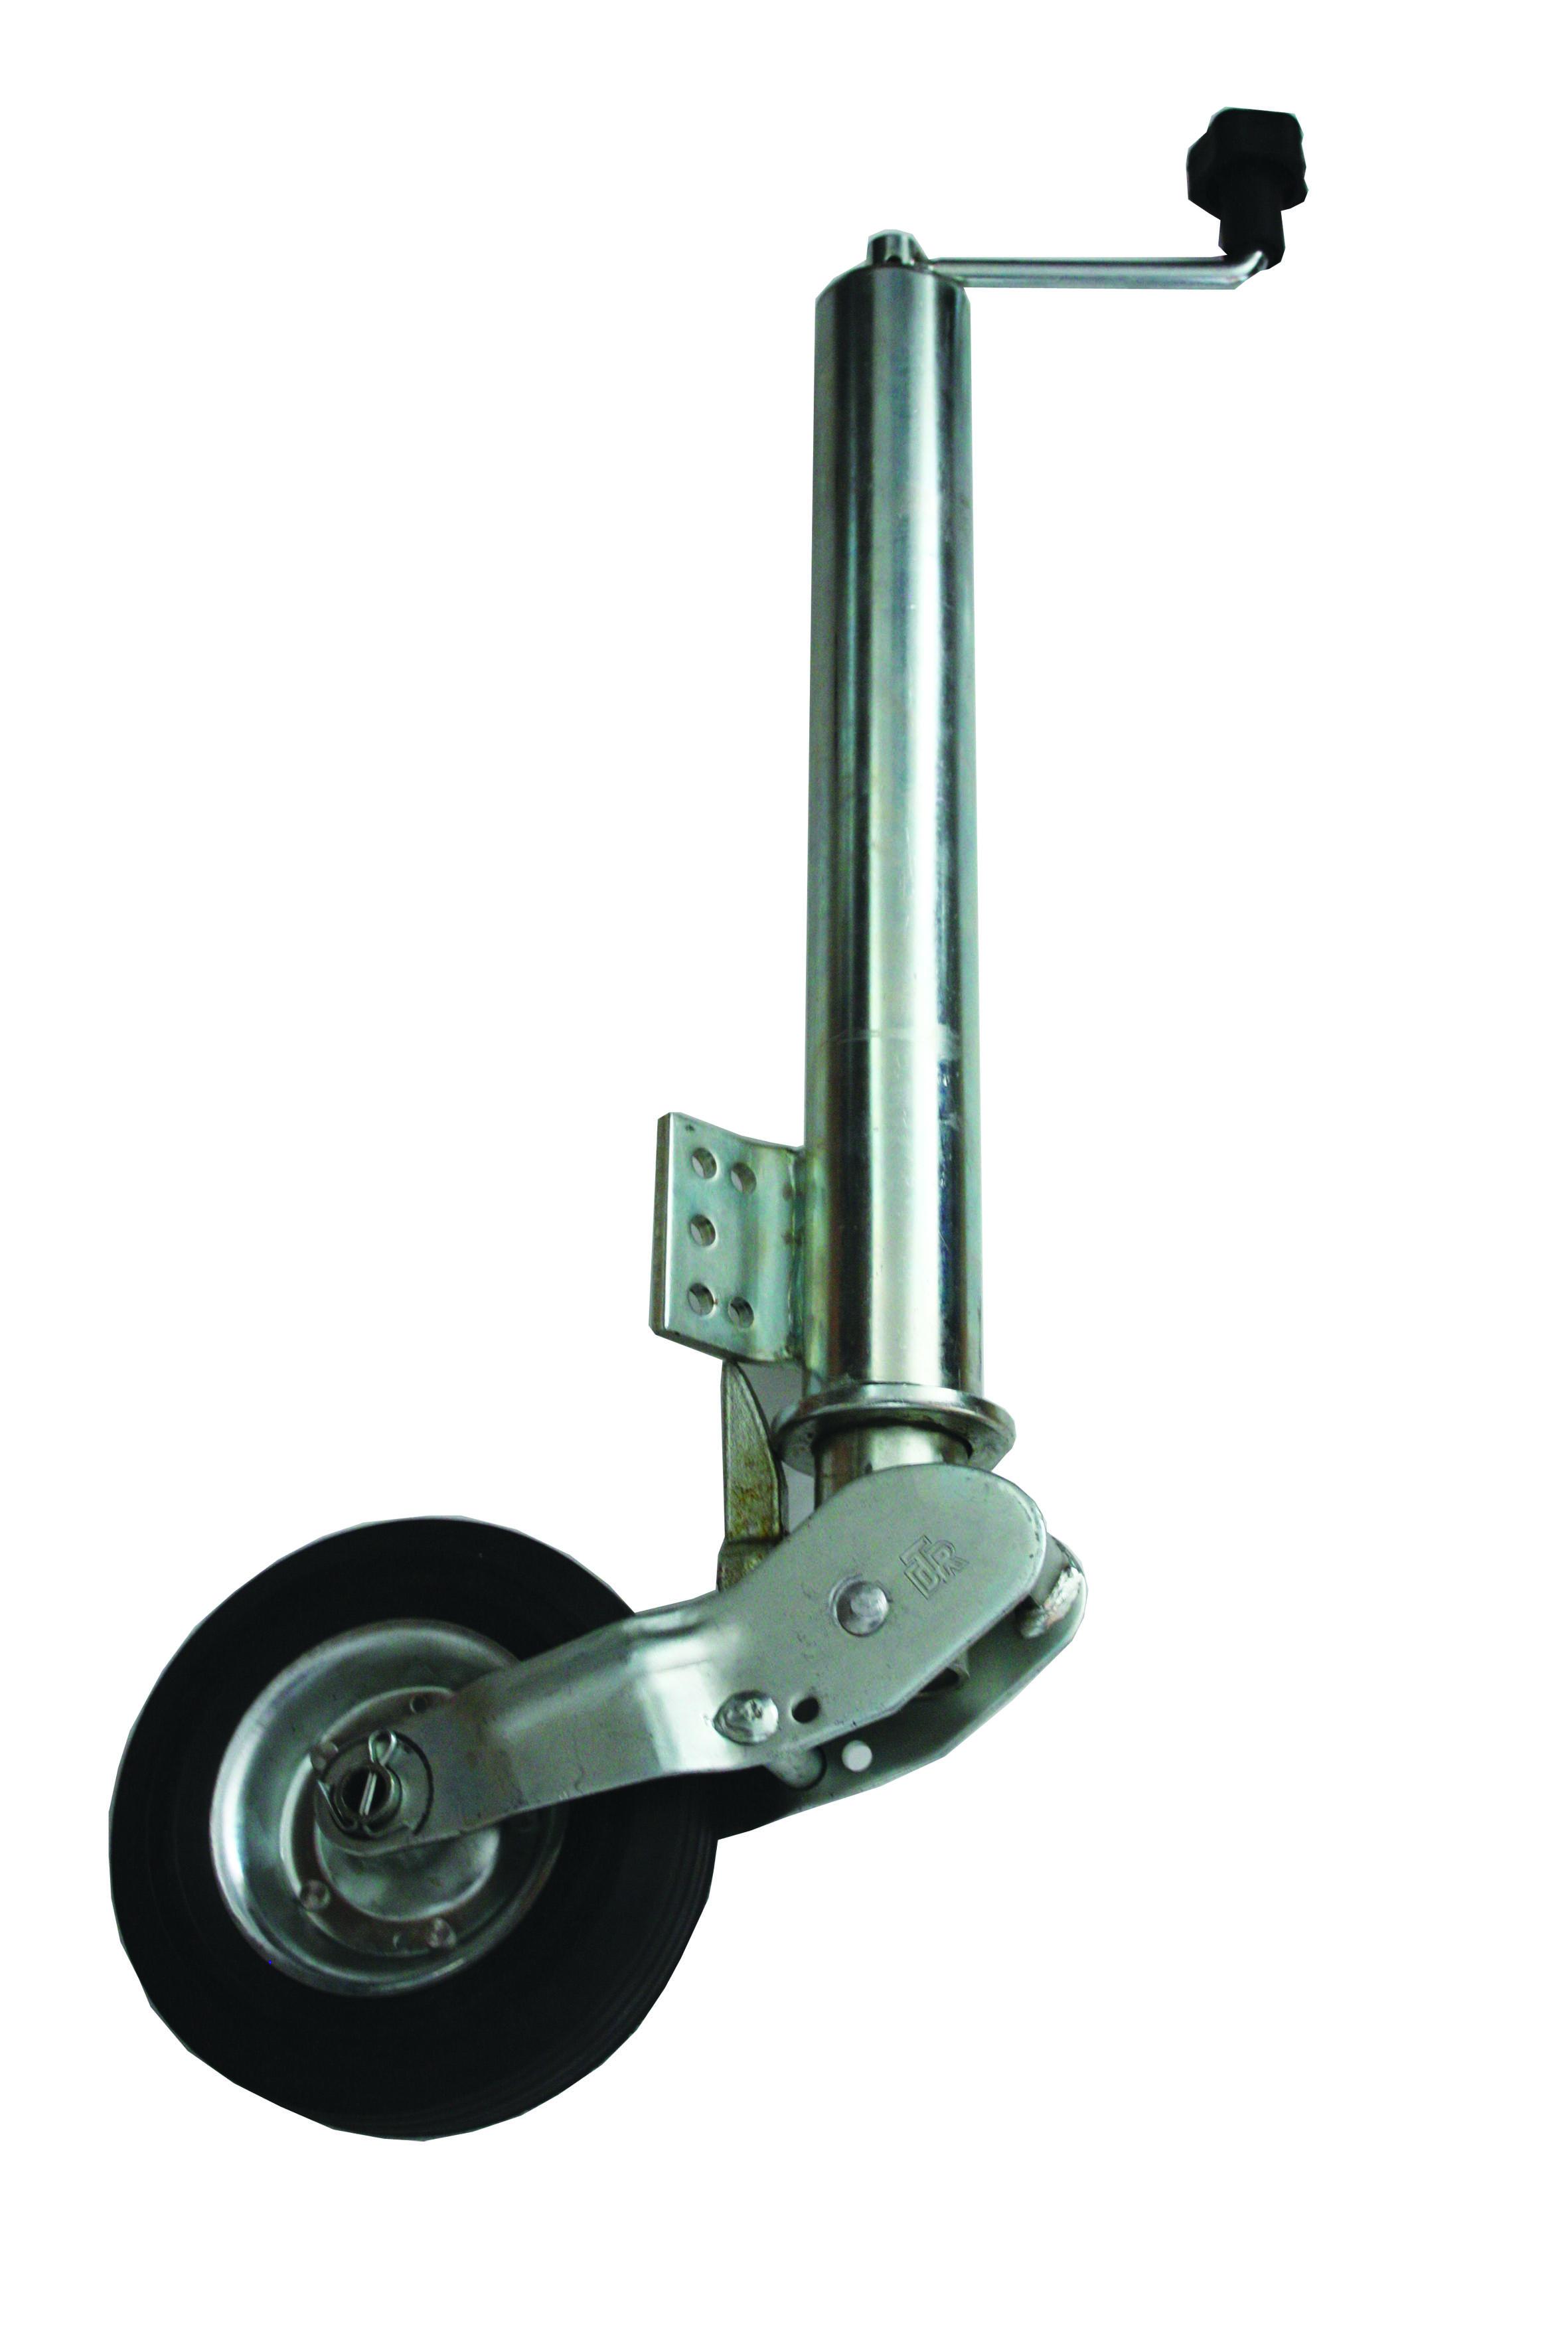 9f5648f9432 JS Trailer Parts fuldautomatisk klapbart støttehjul - næsehjul.